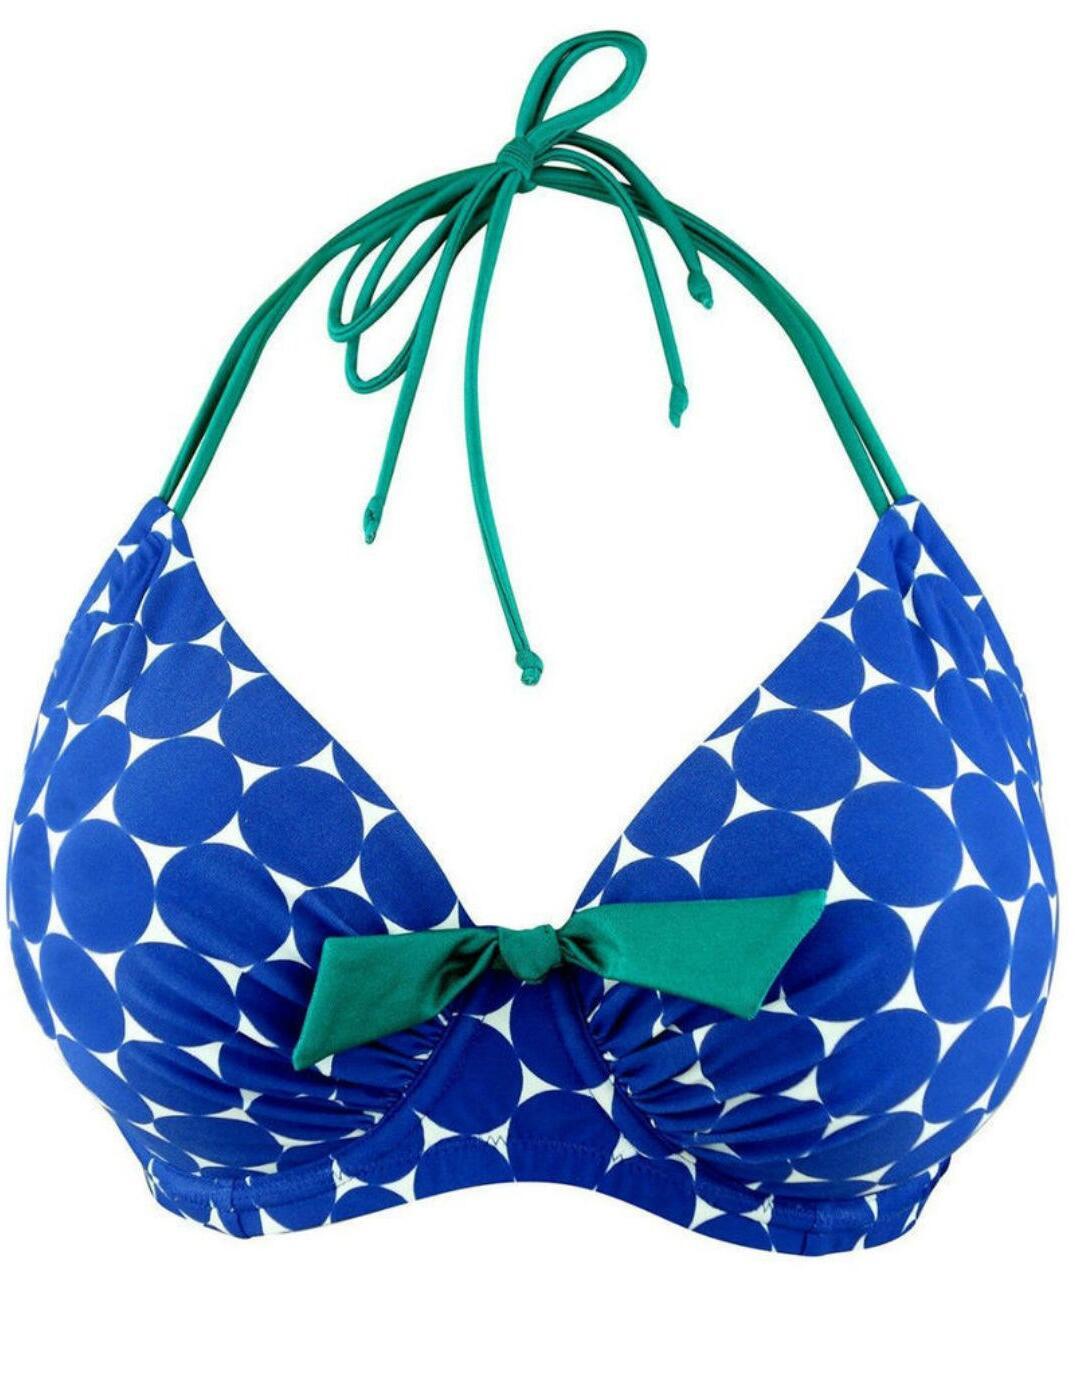 Pour Moi Spot On Halterneck Bikini Top 25002 Blue Multi Print Bikini Top